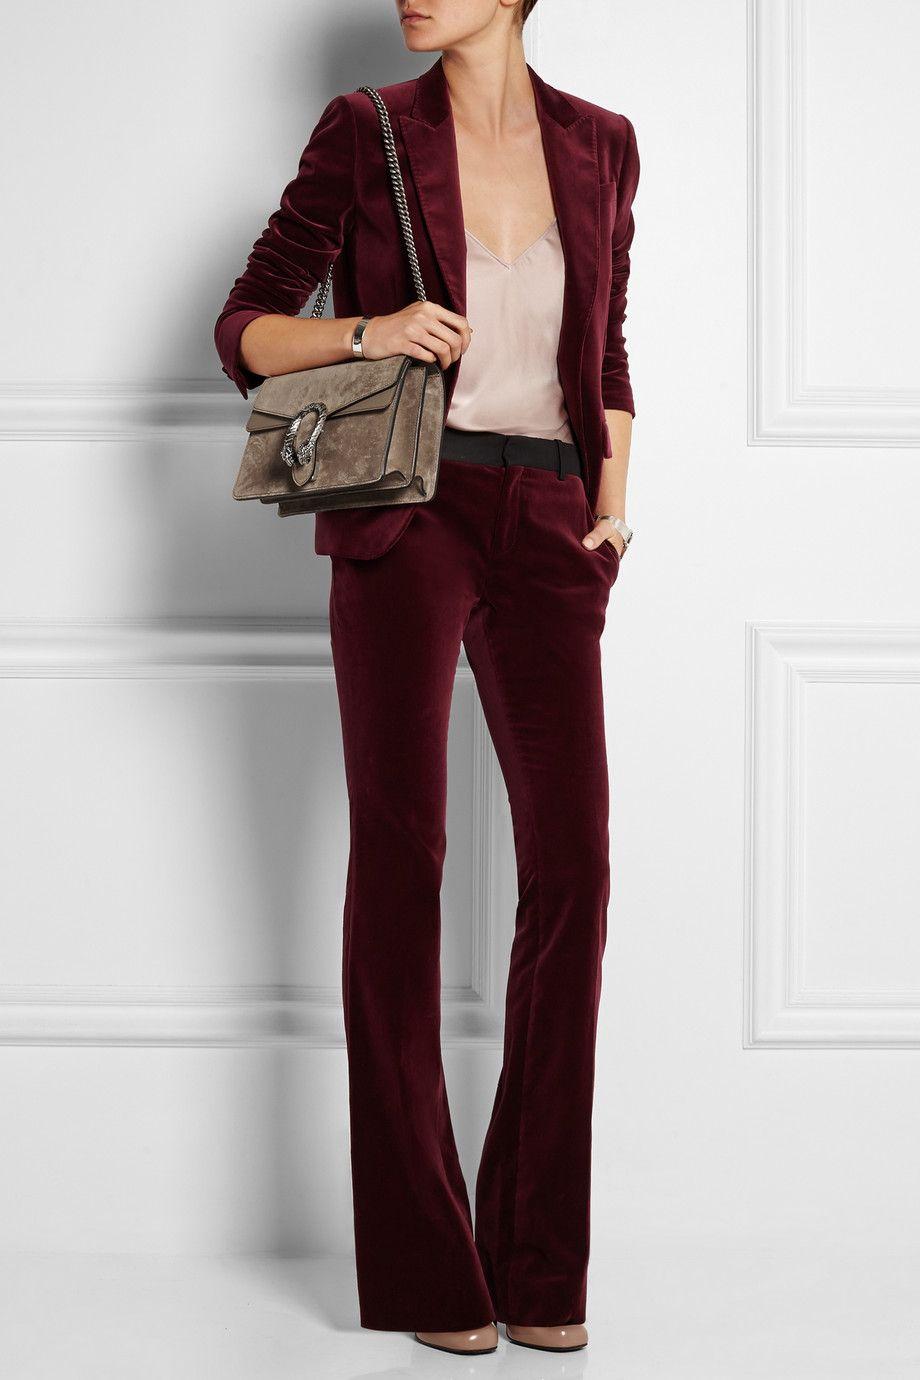 59dd606ff267a9 Gucci | Dionysus small suede shoulder bag | NET-A-PORTER.COM ...